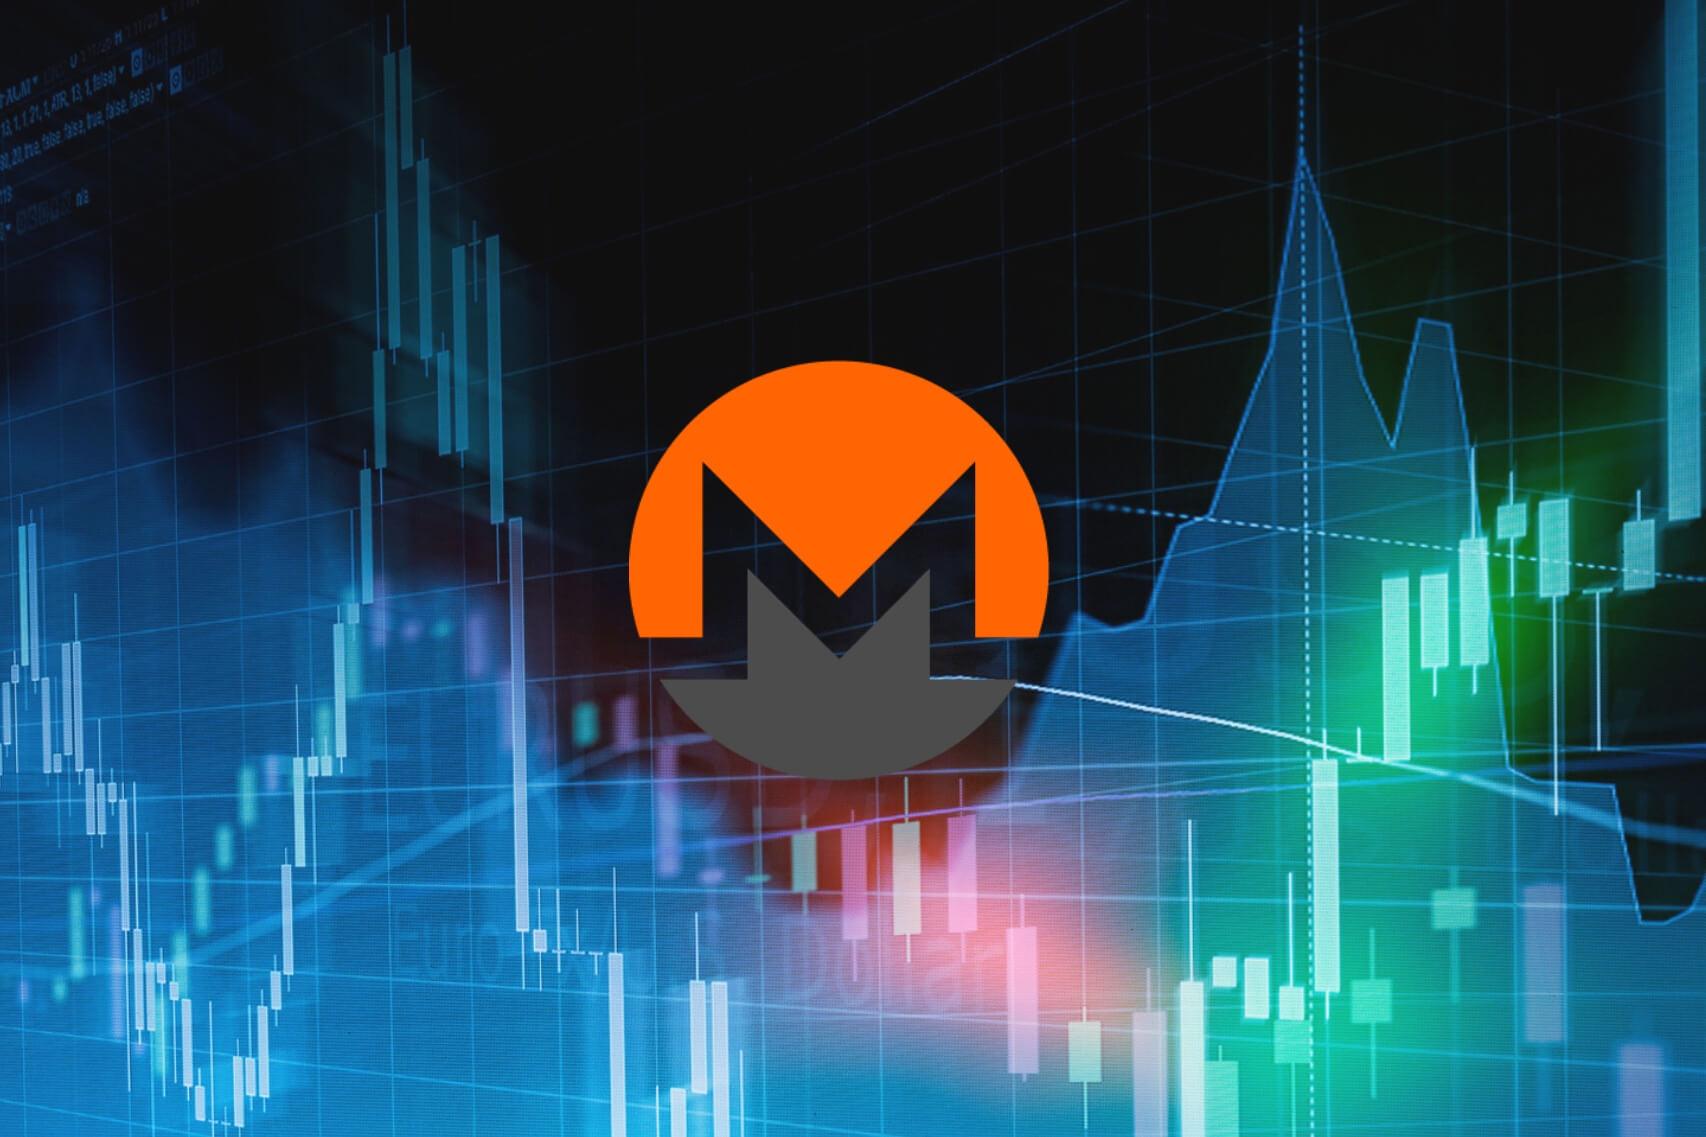 Price Analysis: Monero